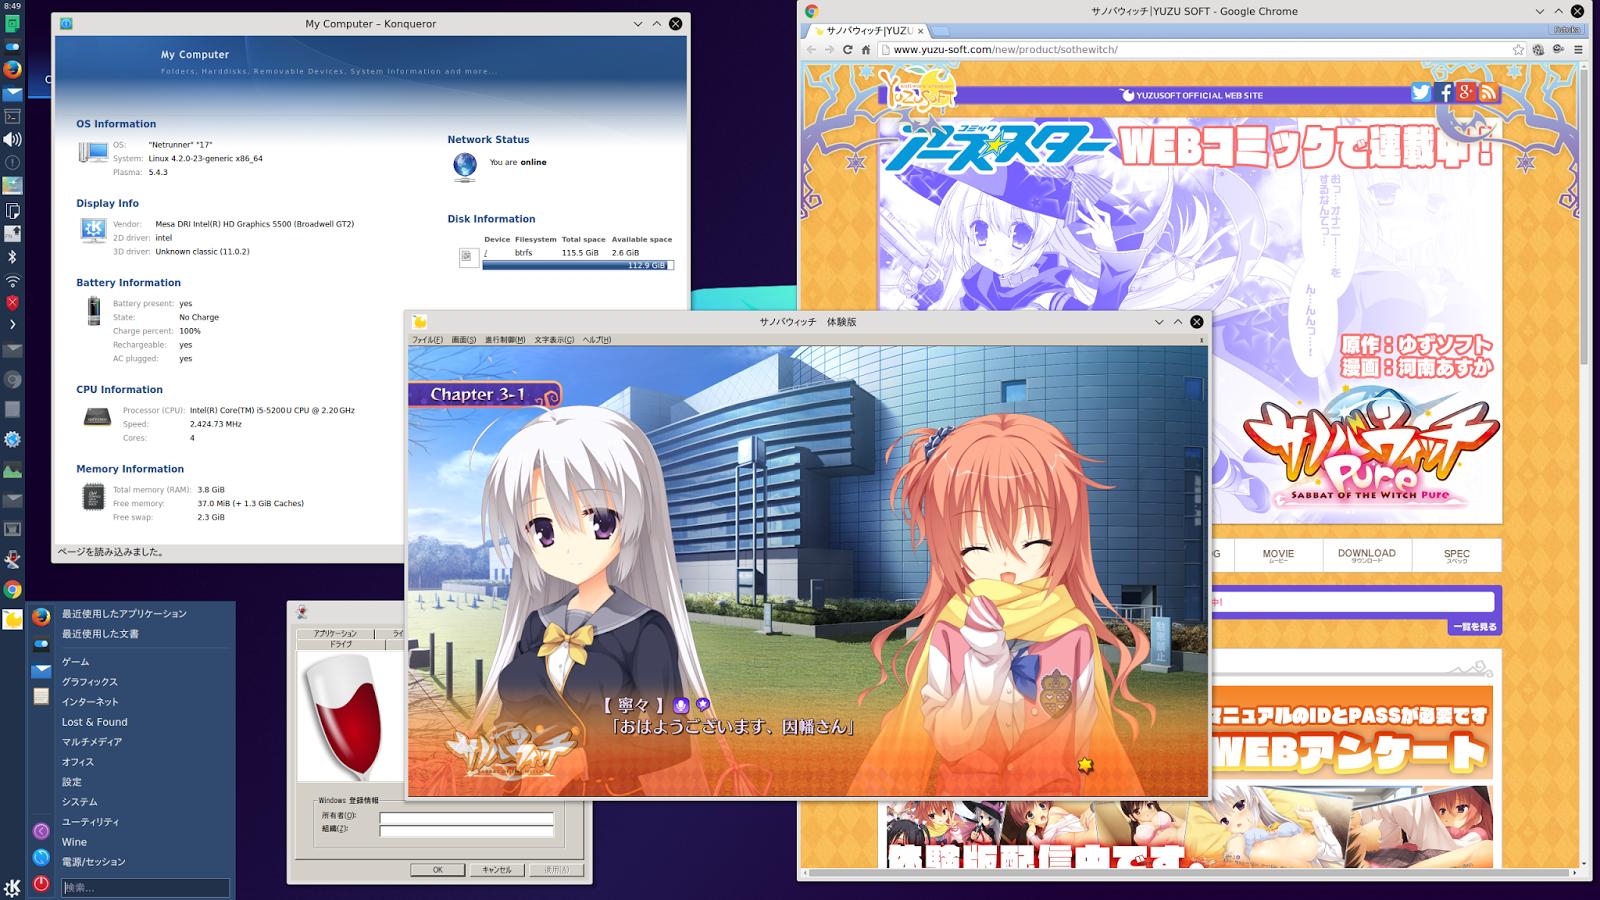 Netrunner 17 〜LinuxでWindowsゲーム〜